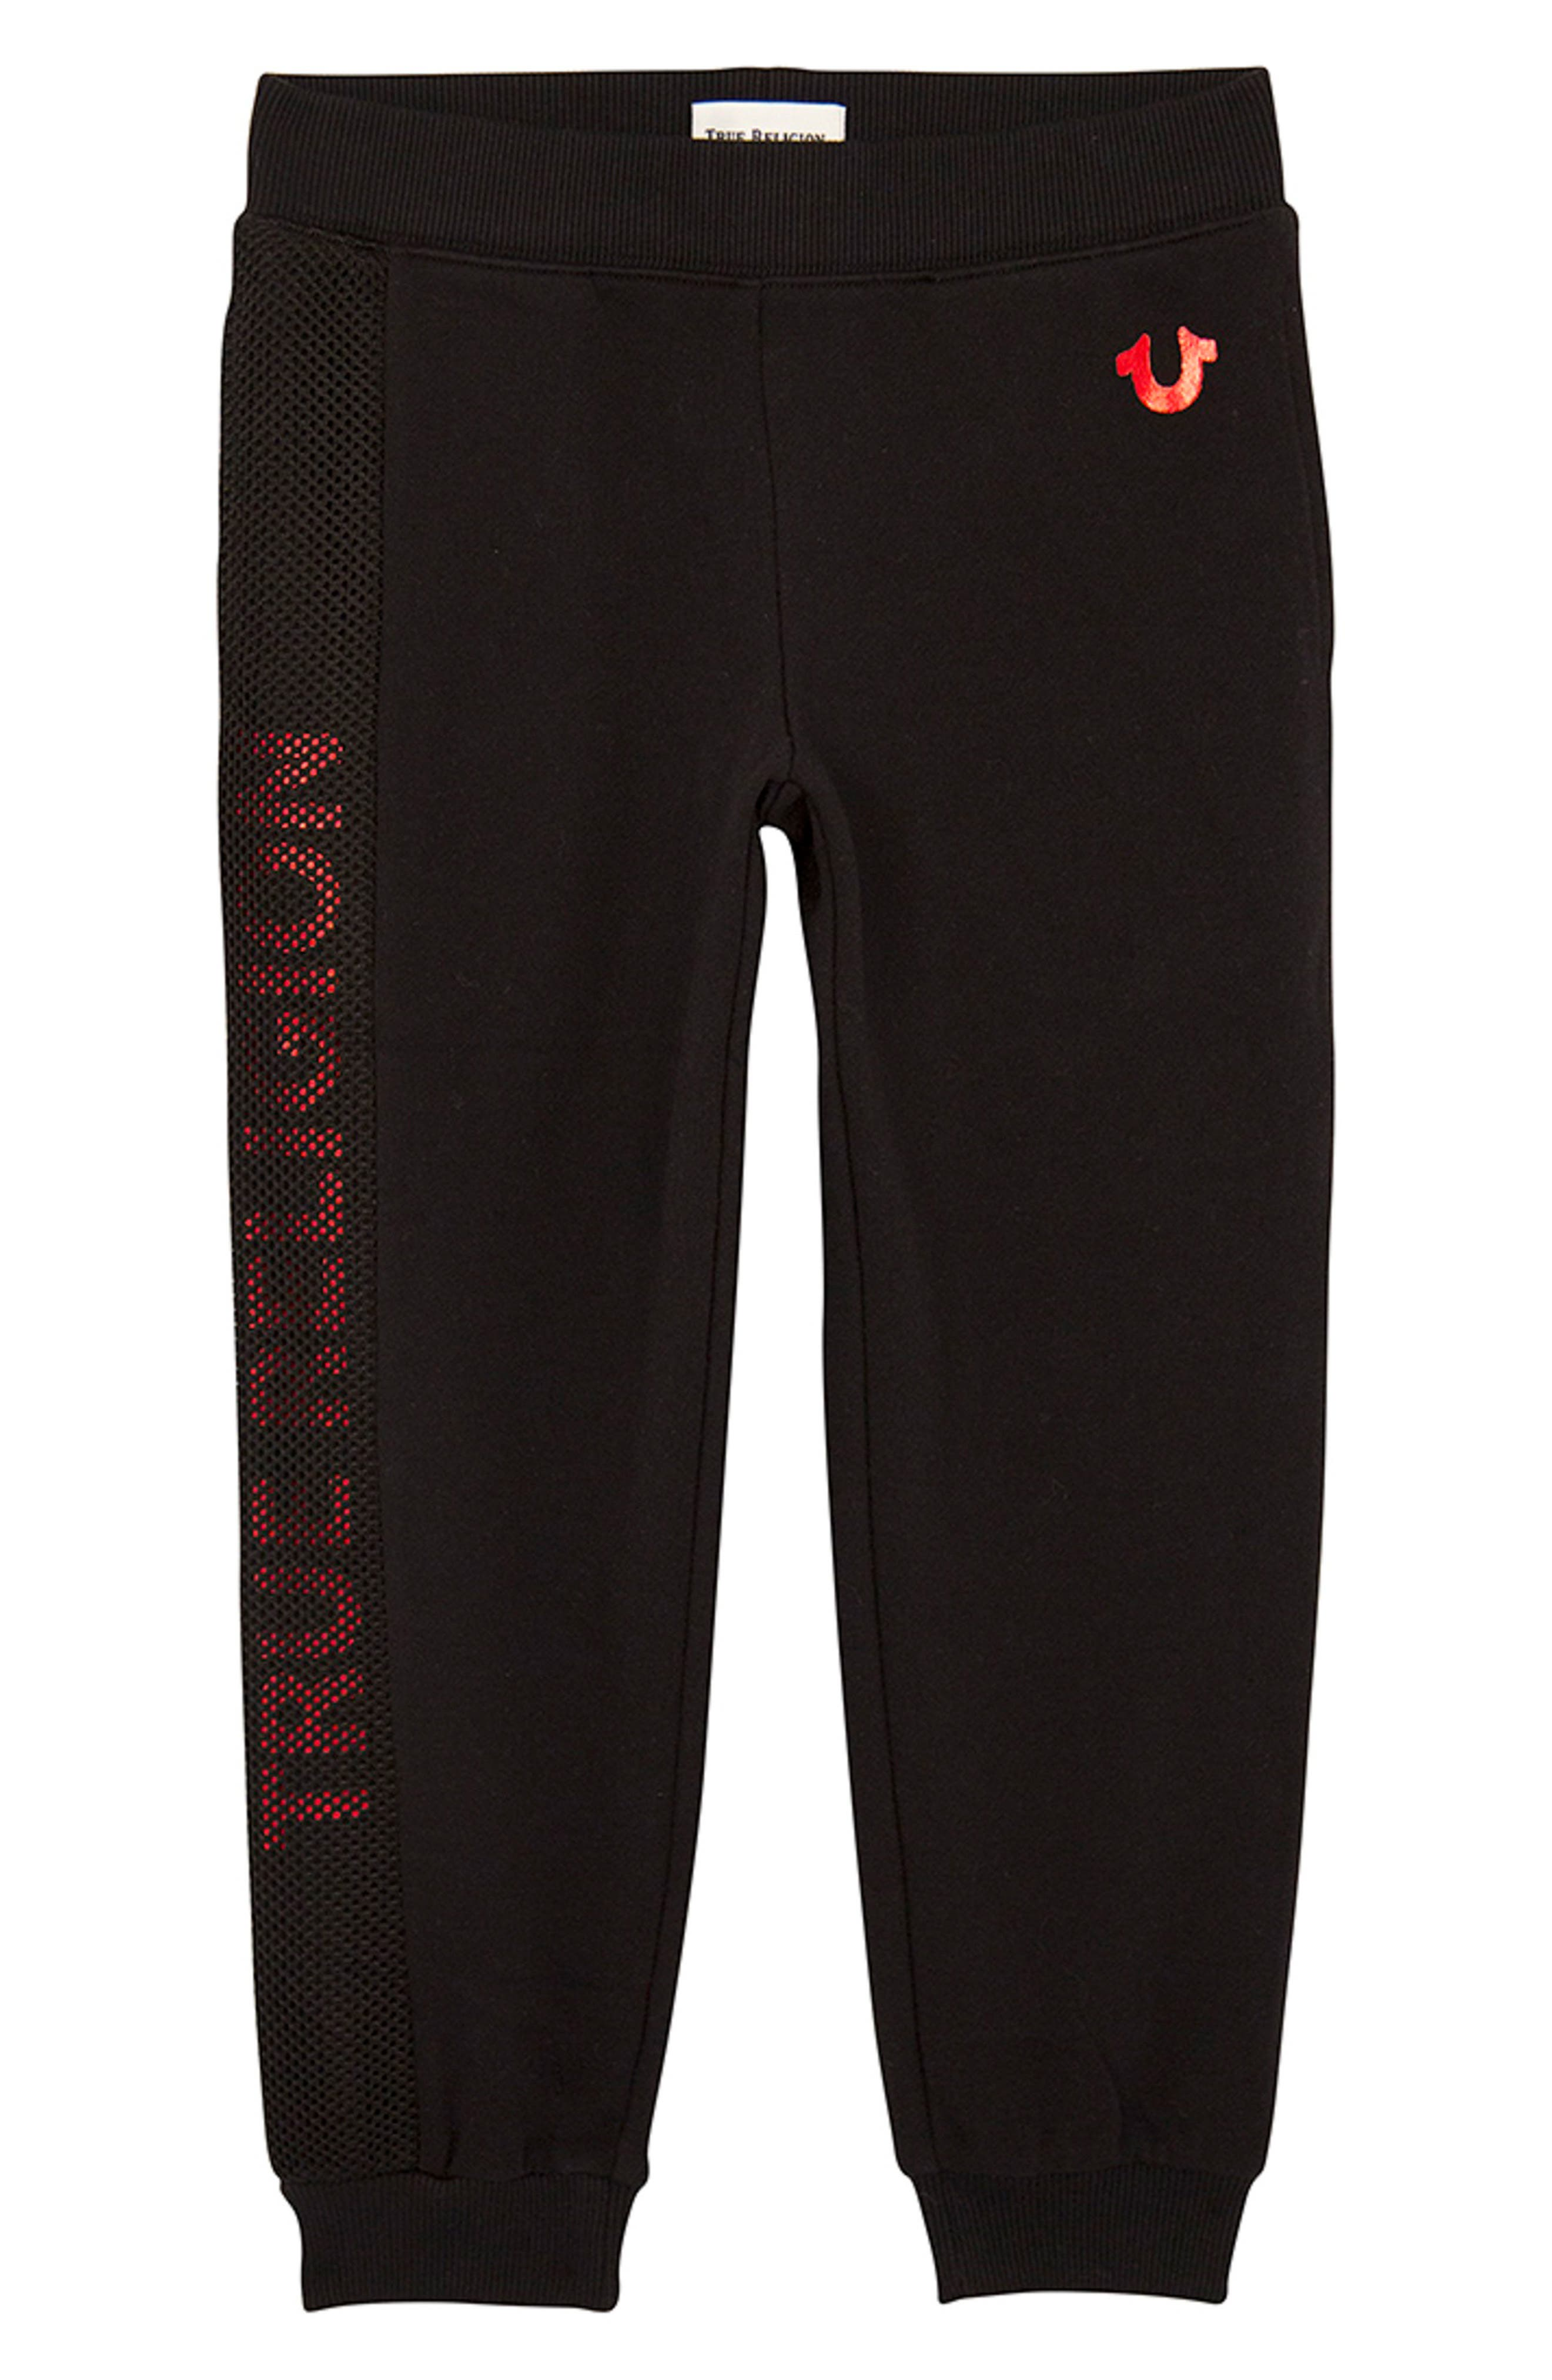 Boys True Religion Brand Jeans Mesh Logo Sweatpants Size L (1012)  Black